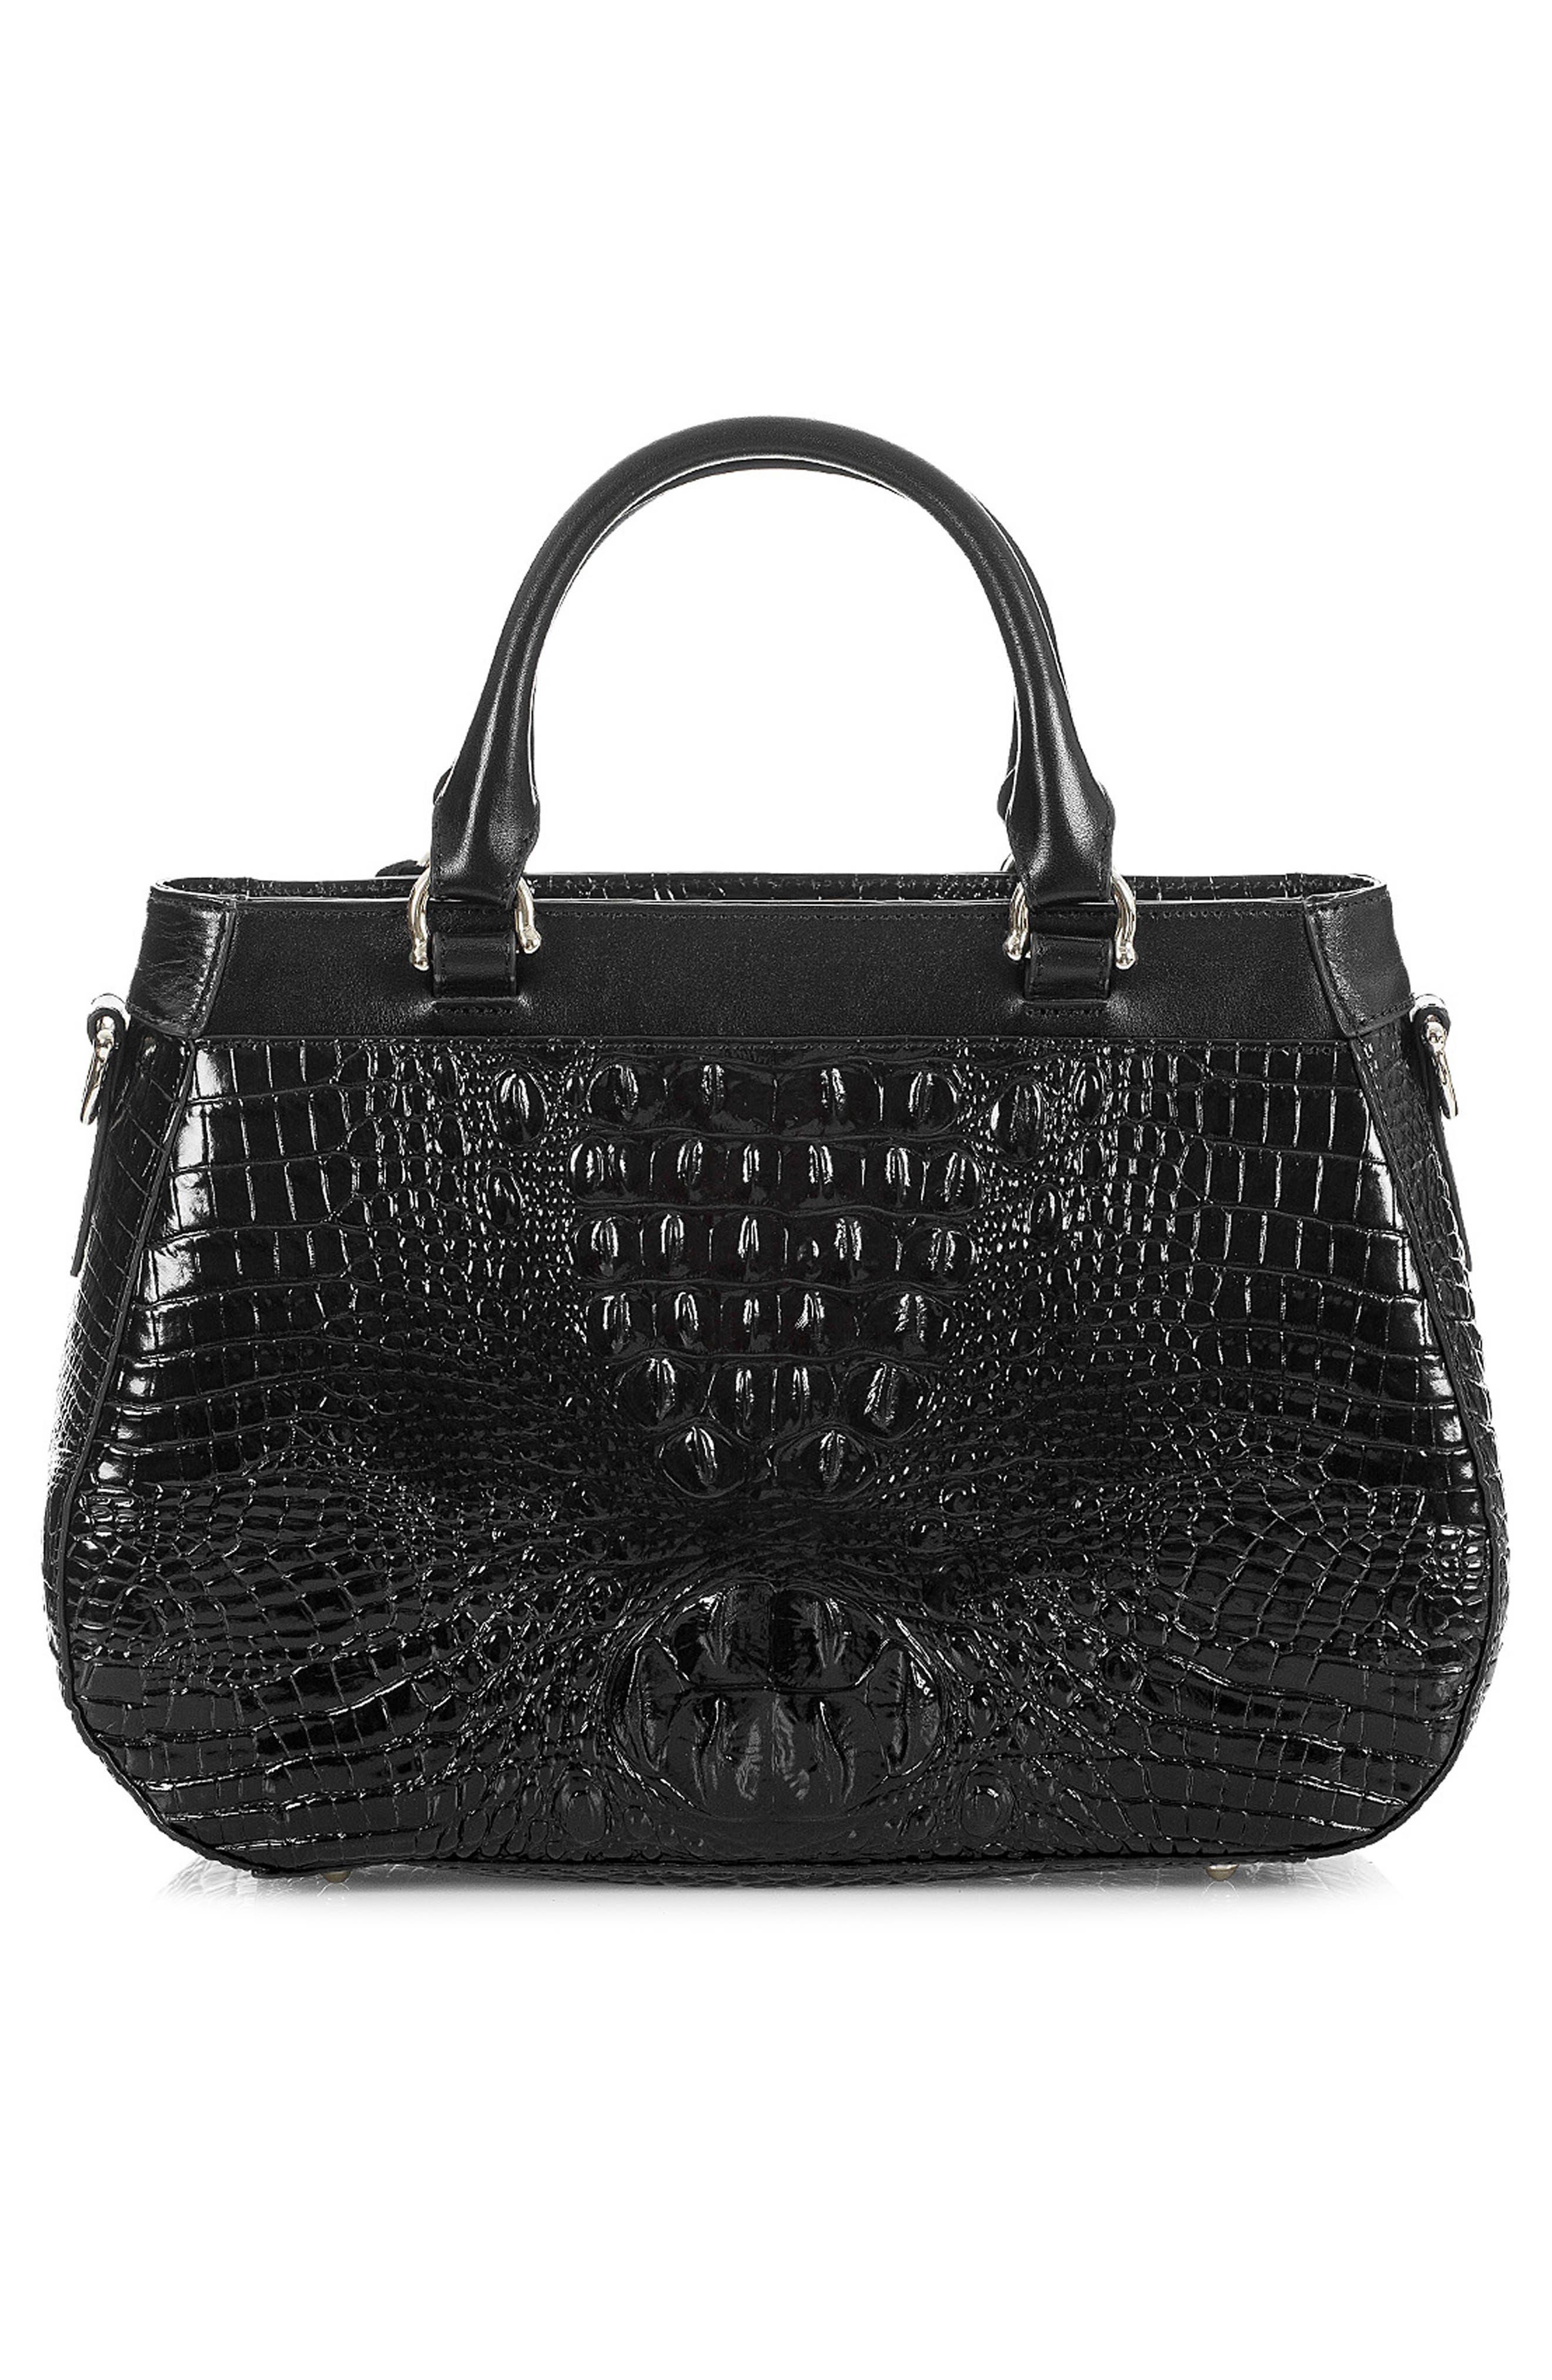 Raelynn Croc Embossed Leather Satchel,                             Alternate thumbnail 3, color,                             BLACK